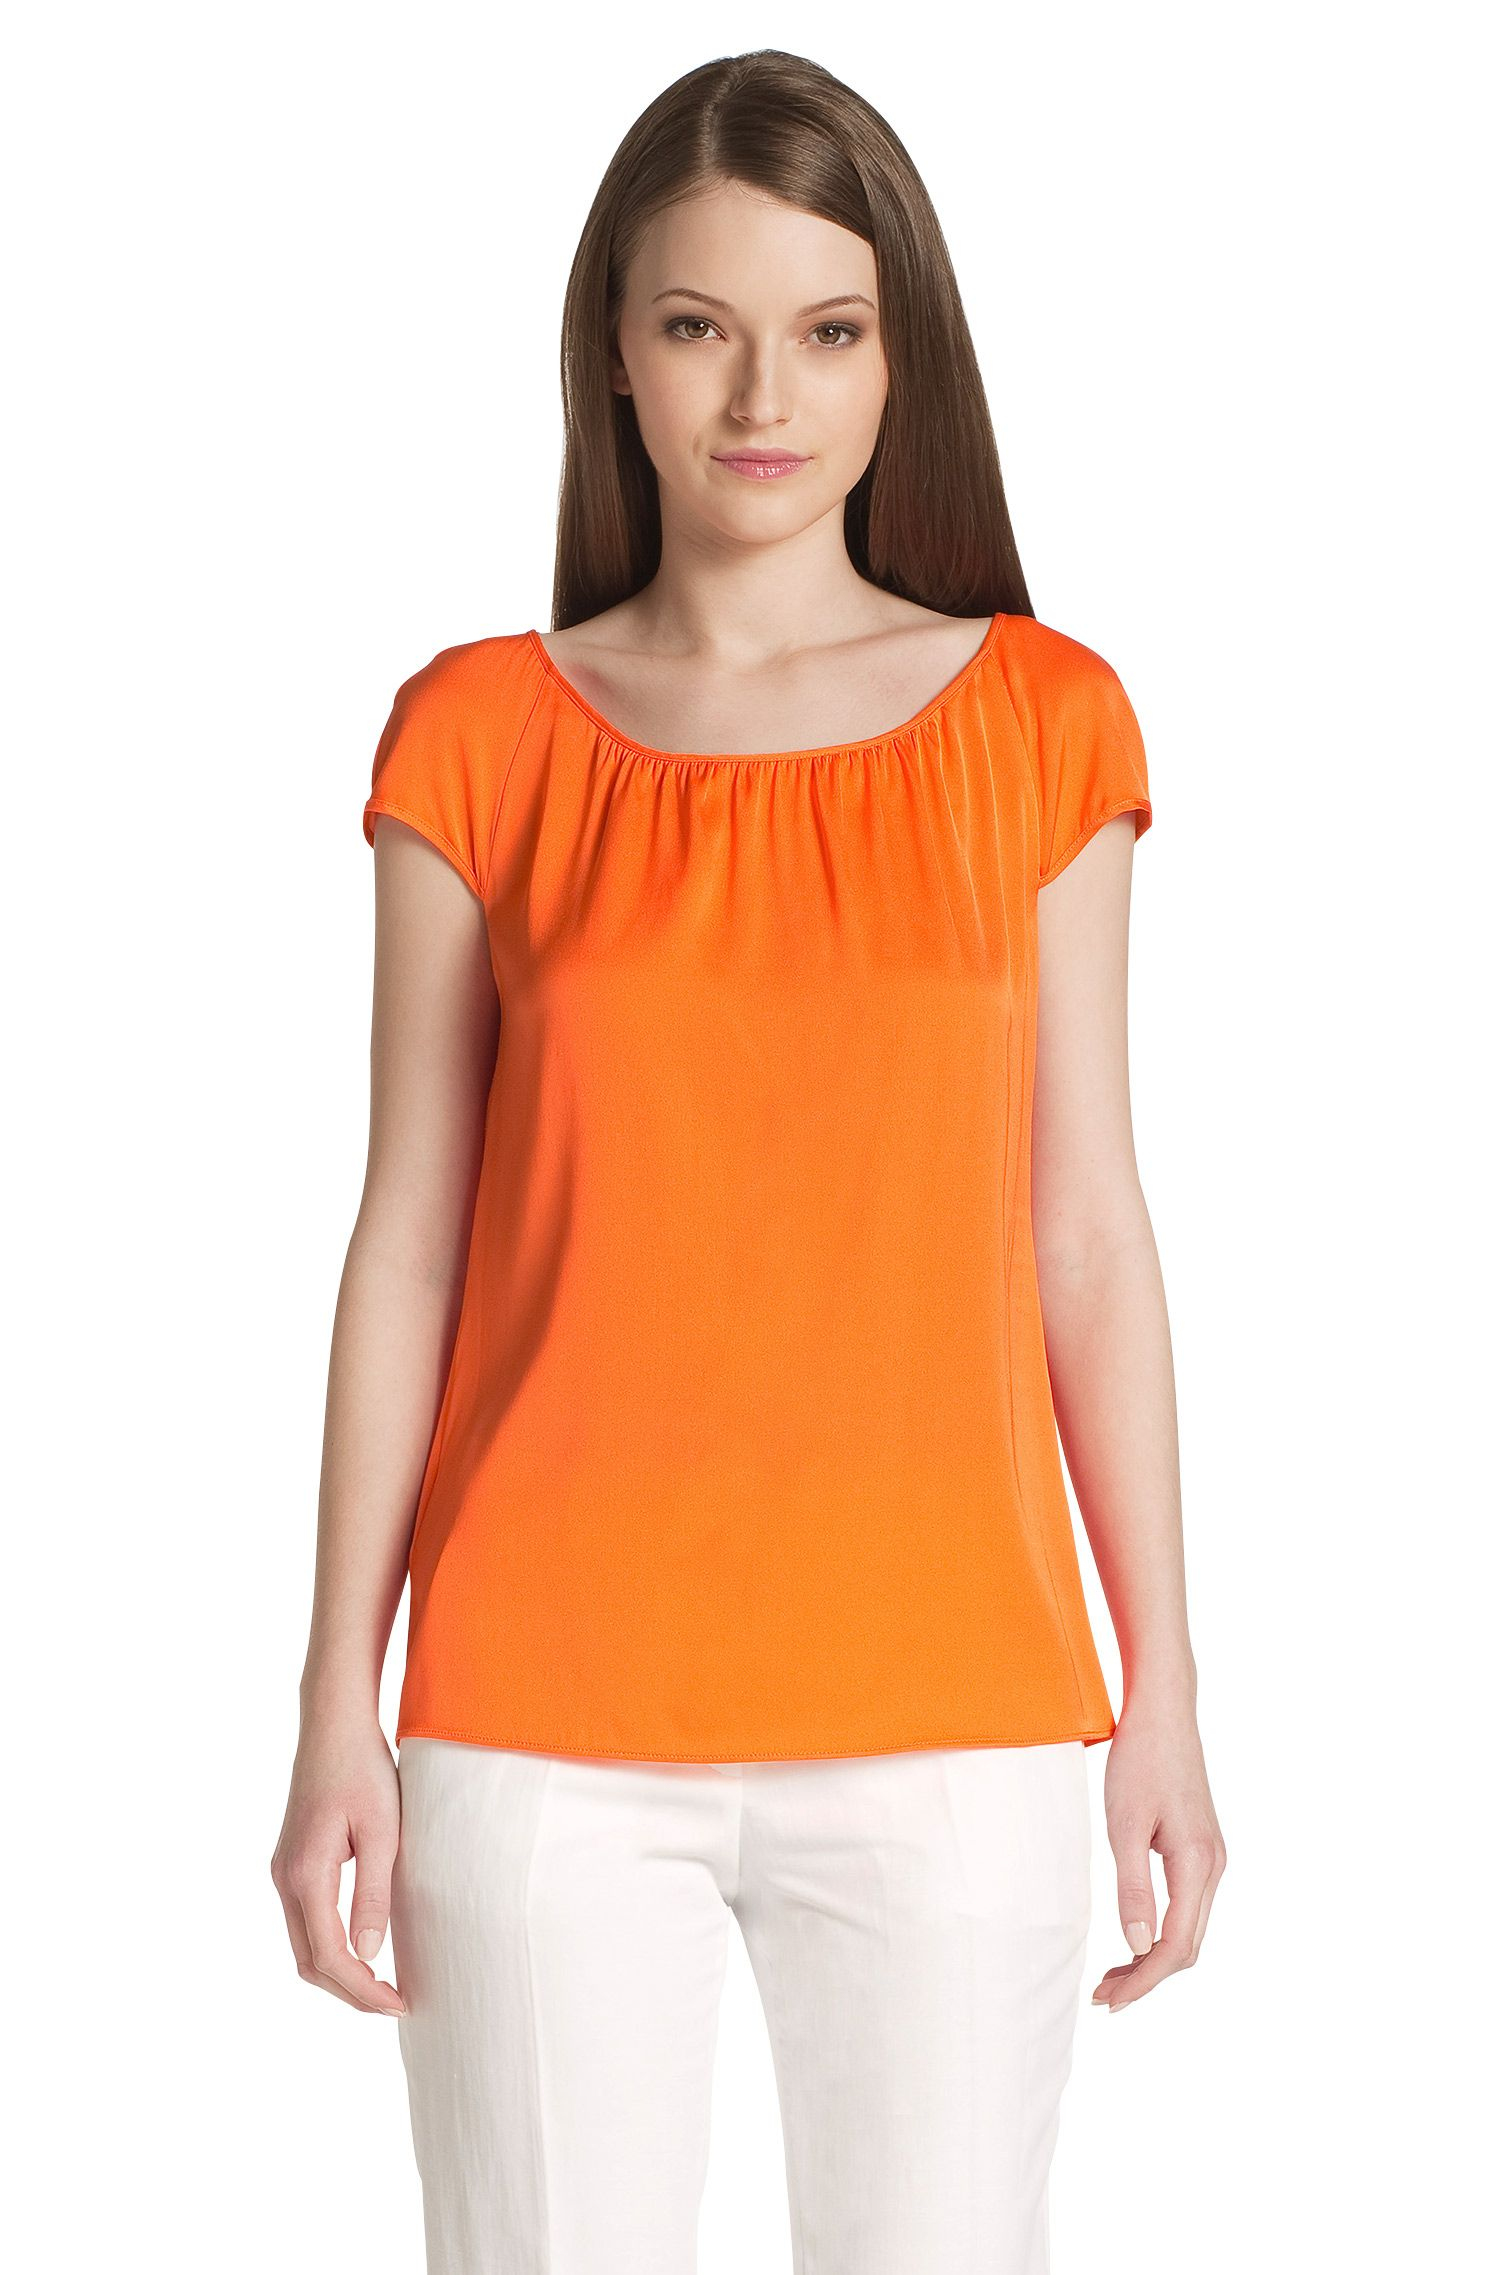 Topje ´Catoni-1` van zijdemix, Oranje